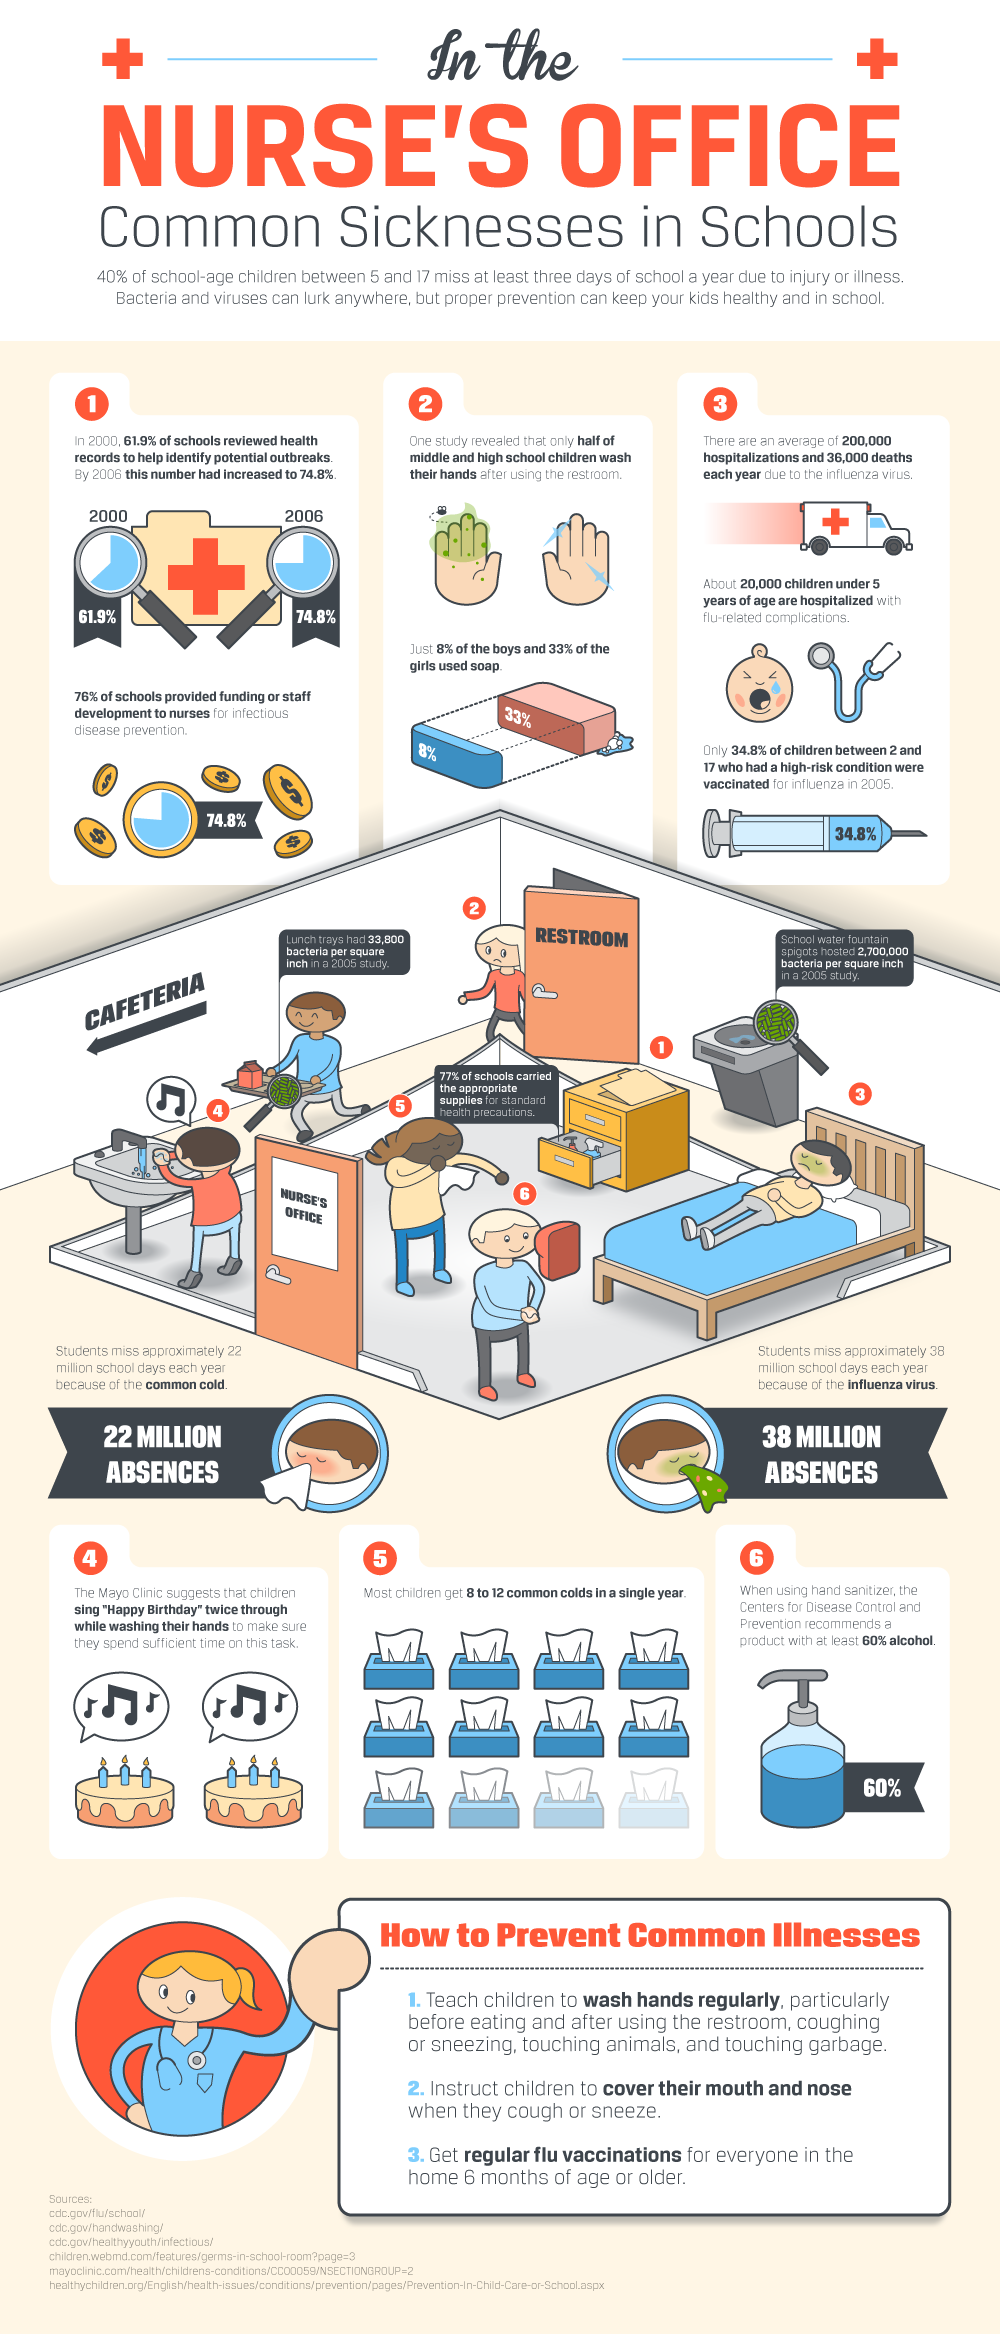 Common Illnesses School Nurses Treat Infographic